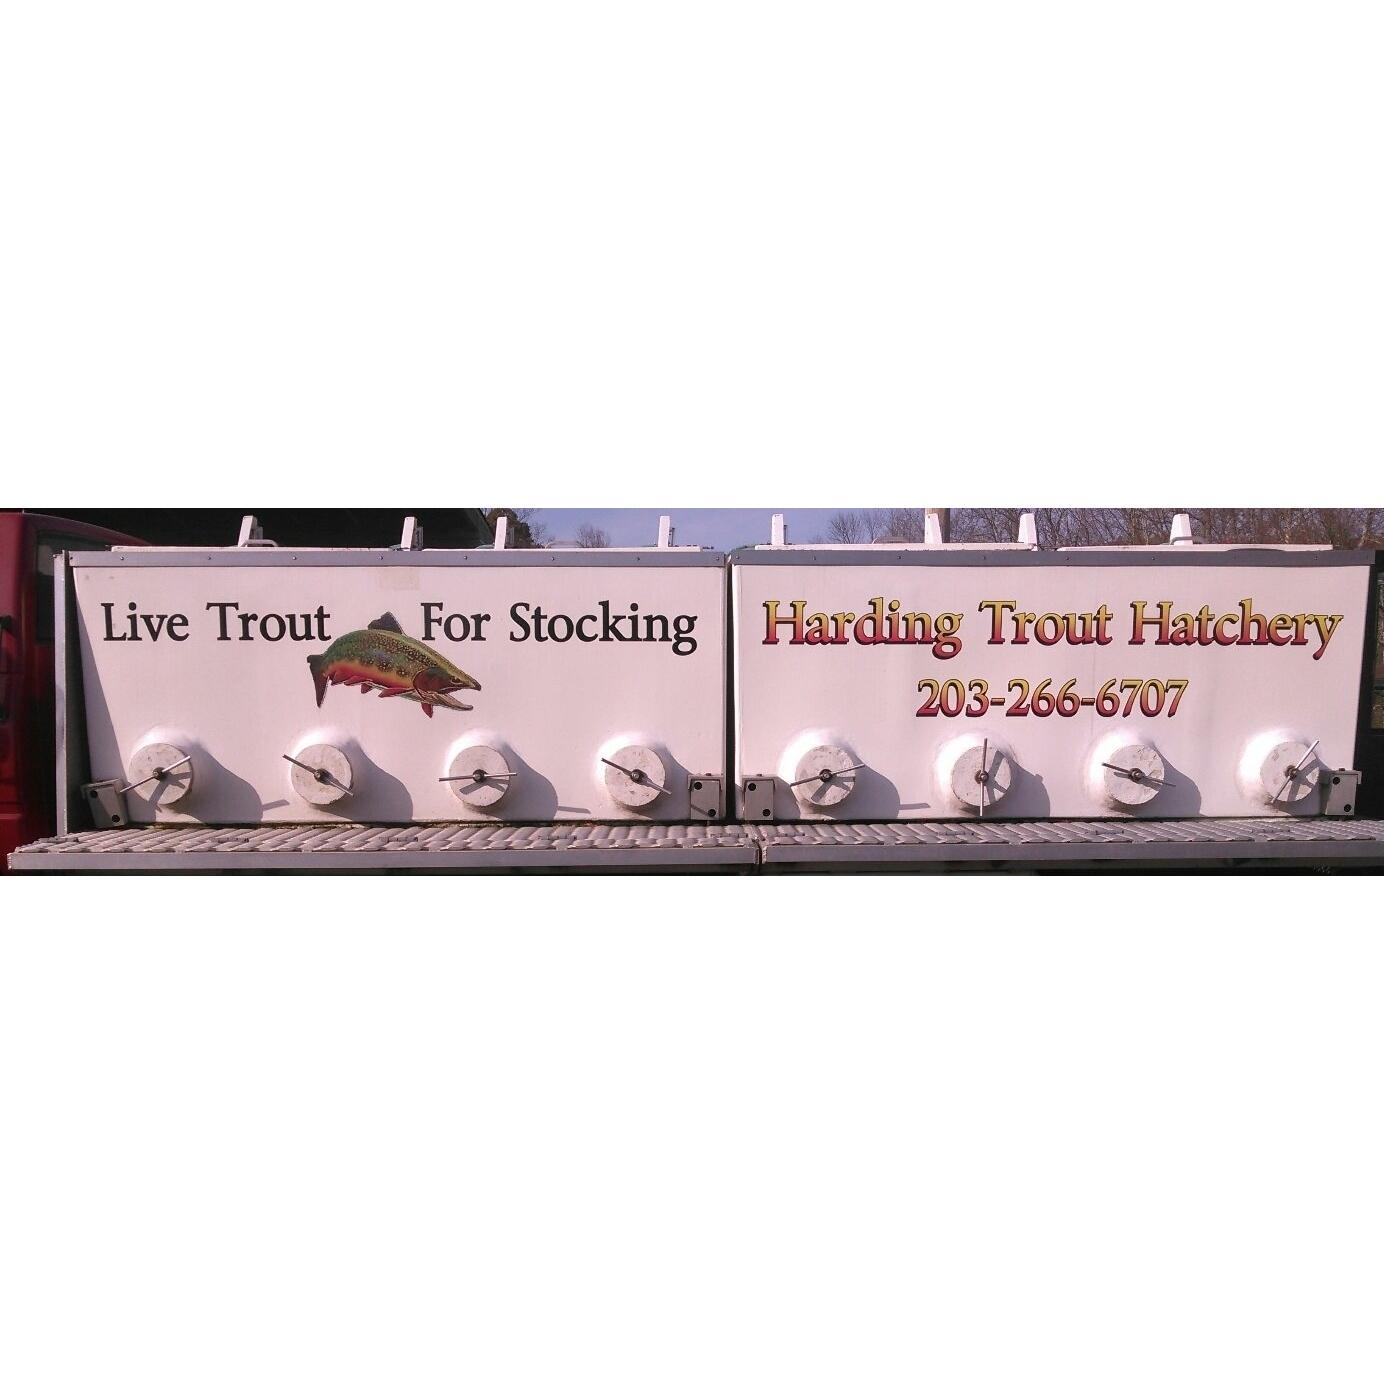 Harding Trout Hatchery image 0